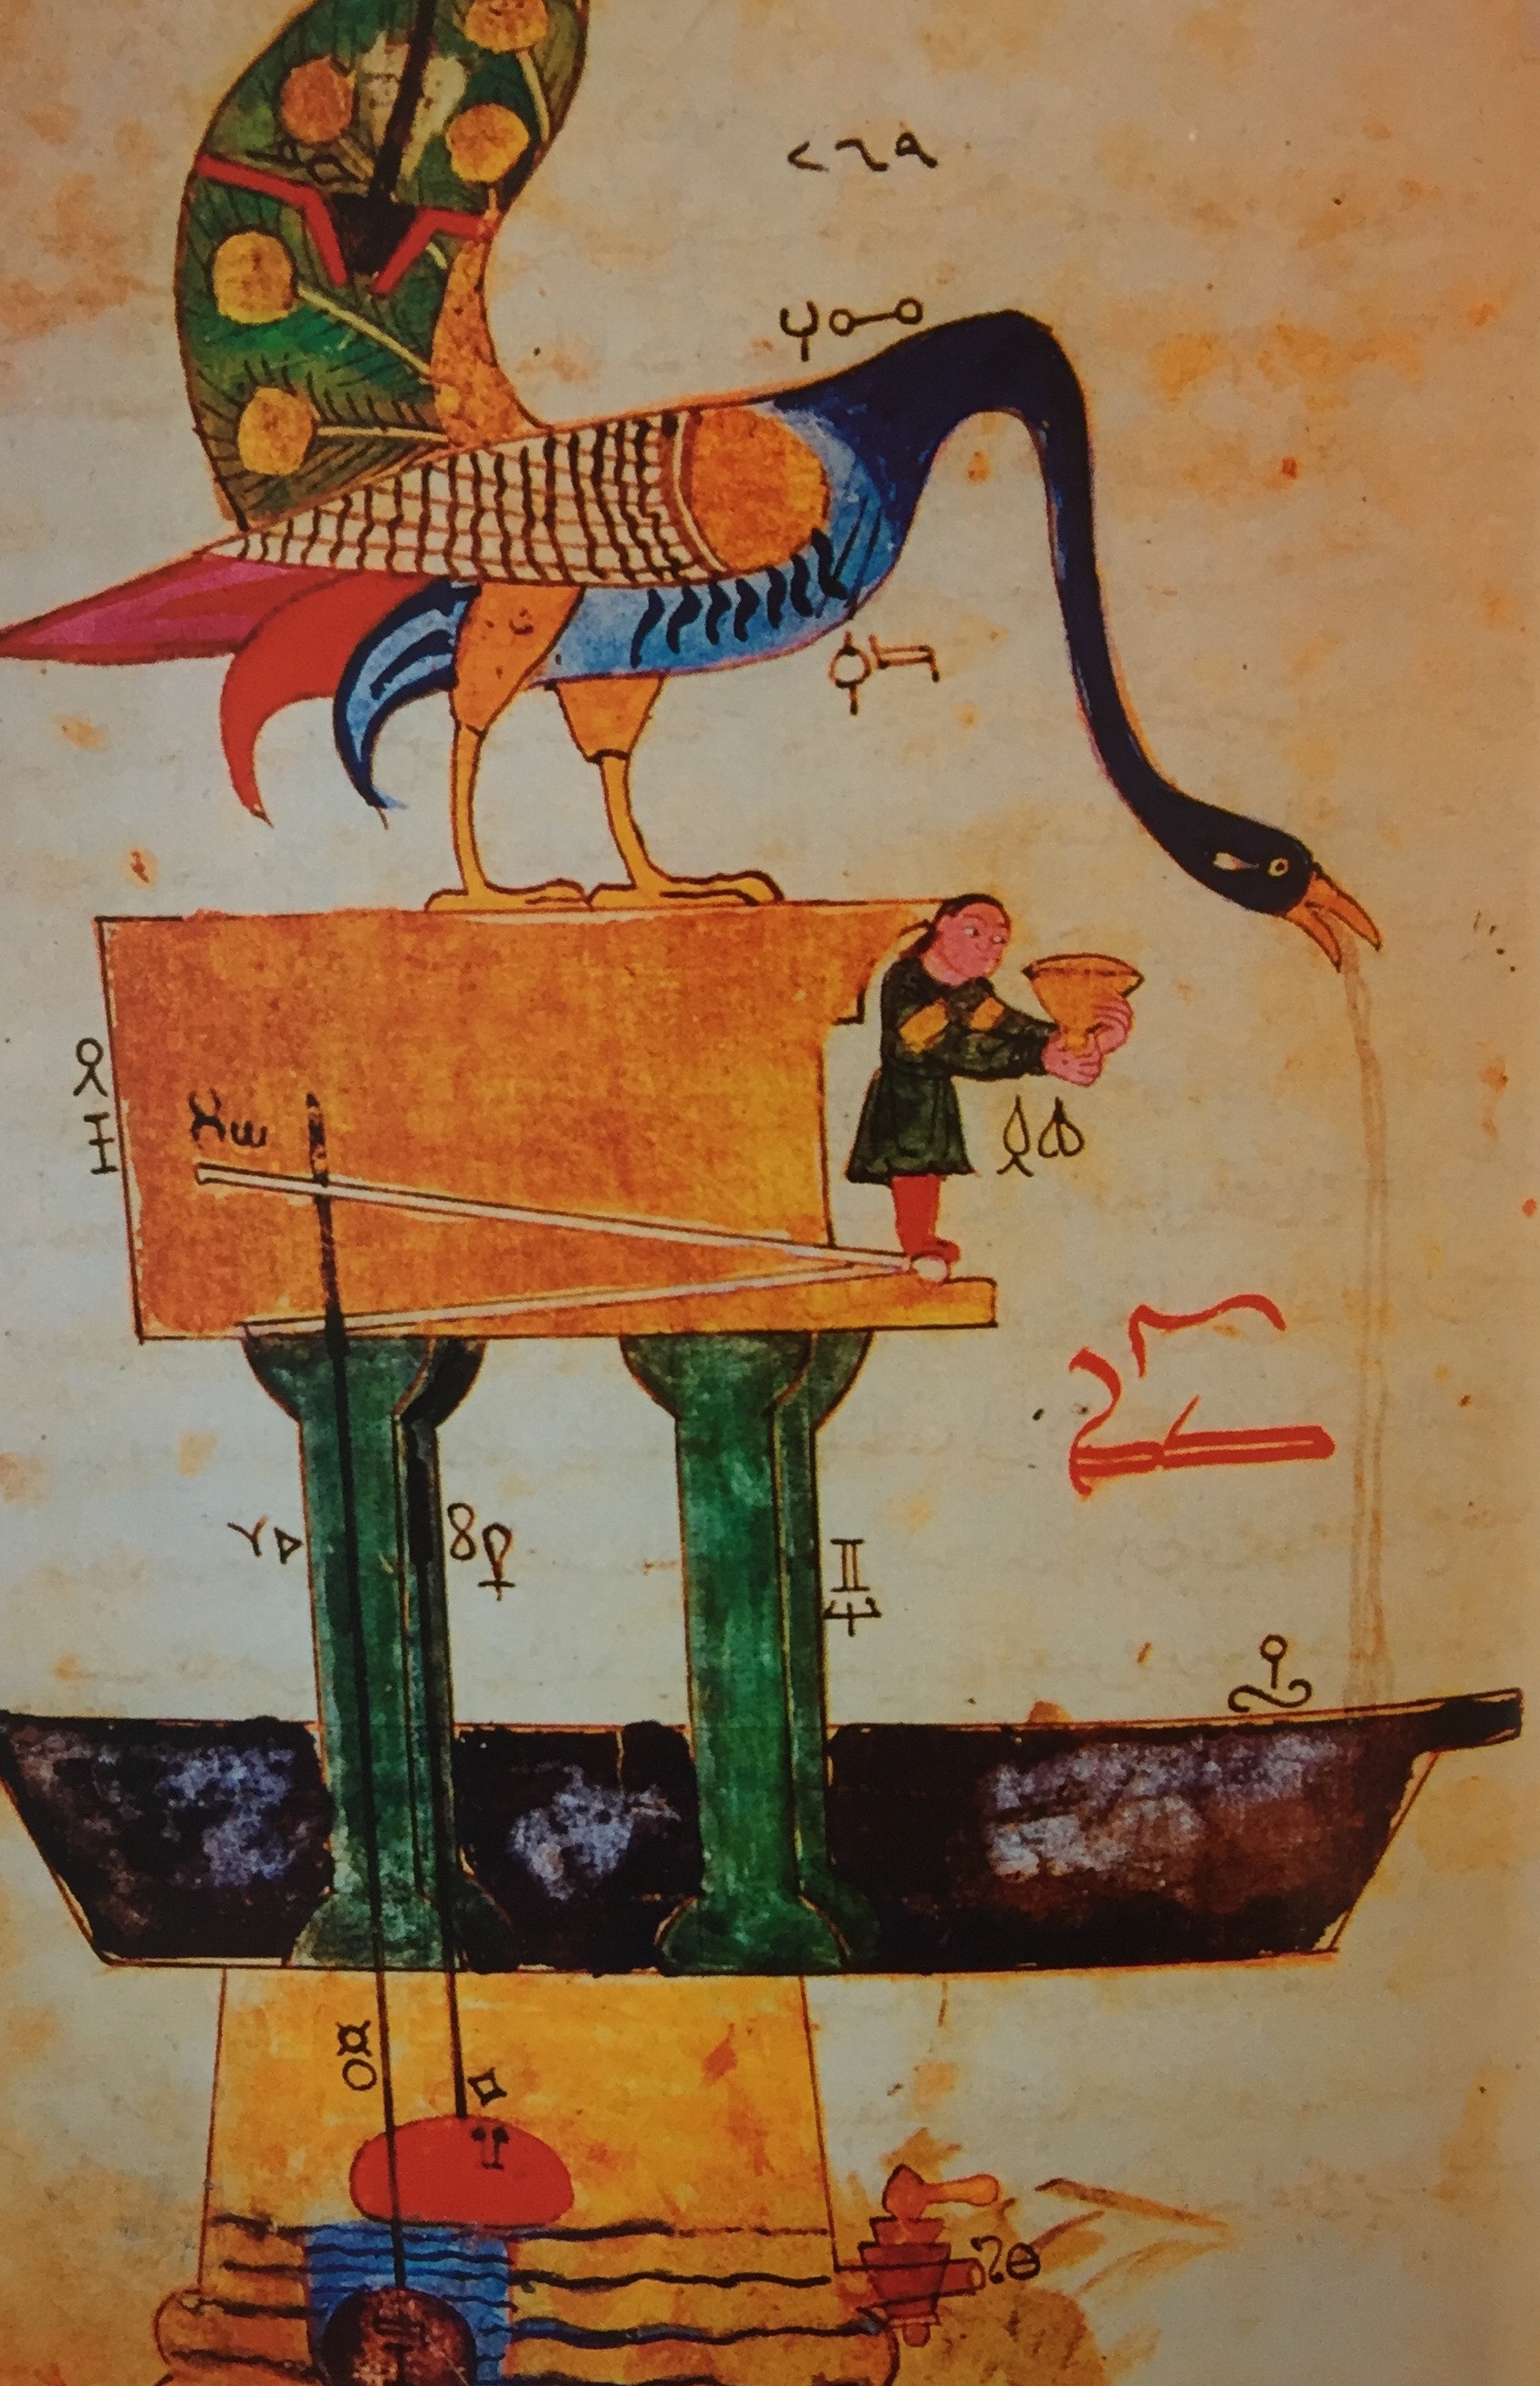 A medieval Islamic hand-washing machine. Courtesy of Nawal Nasrallah.